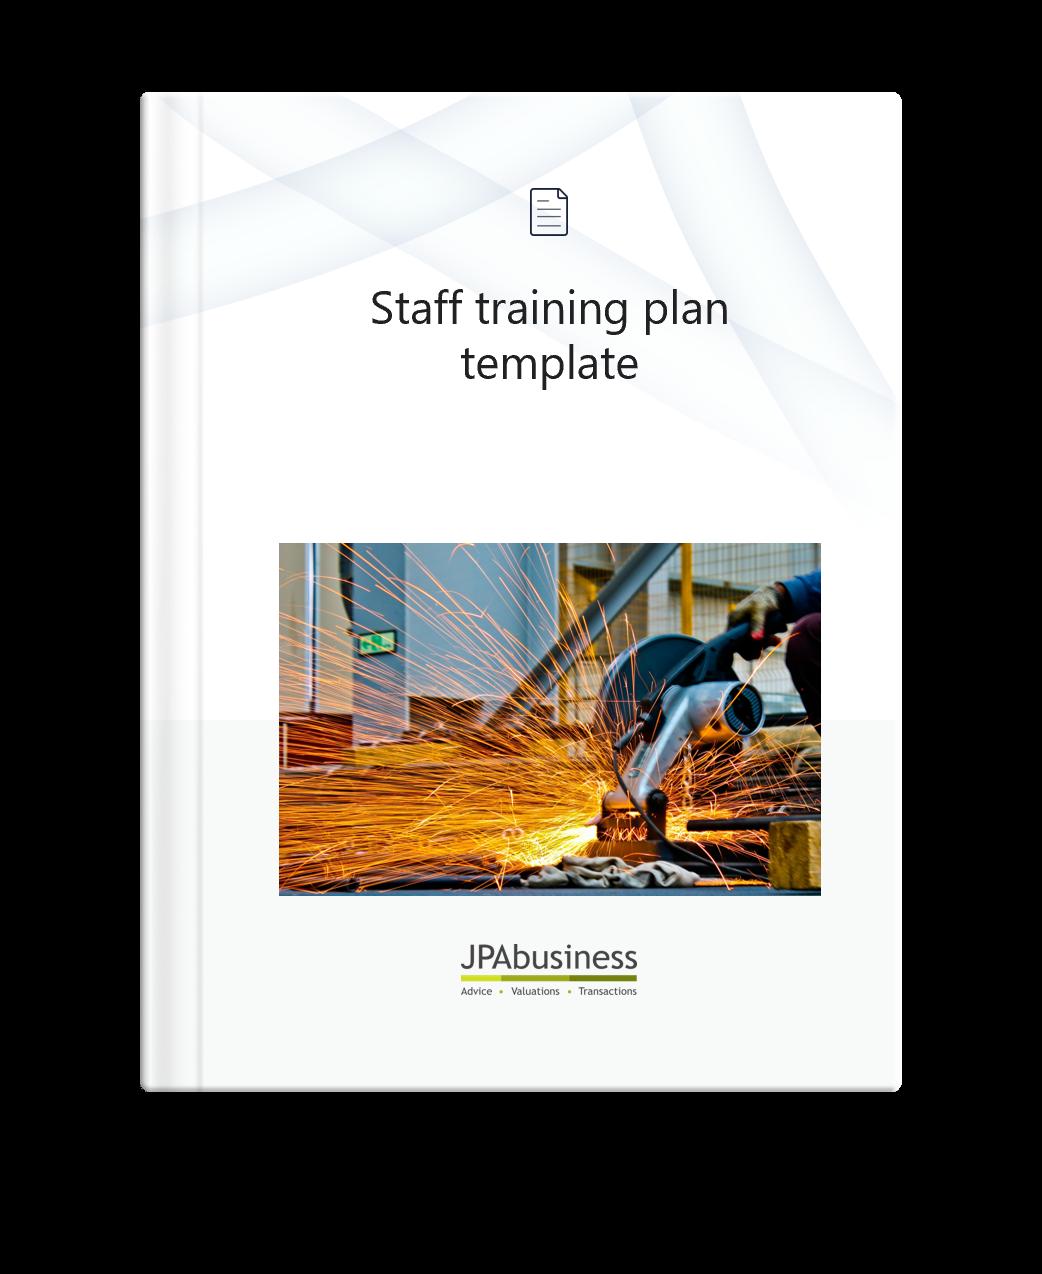 The_Staff_Training_Plan